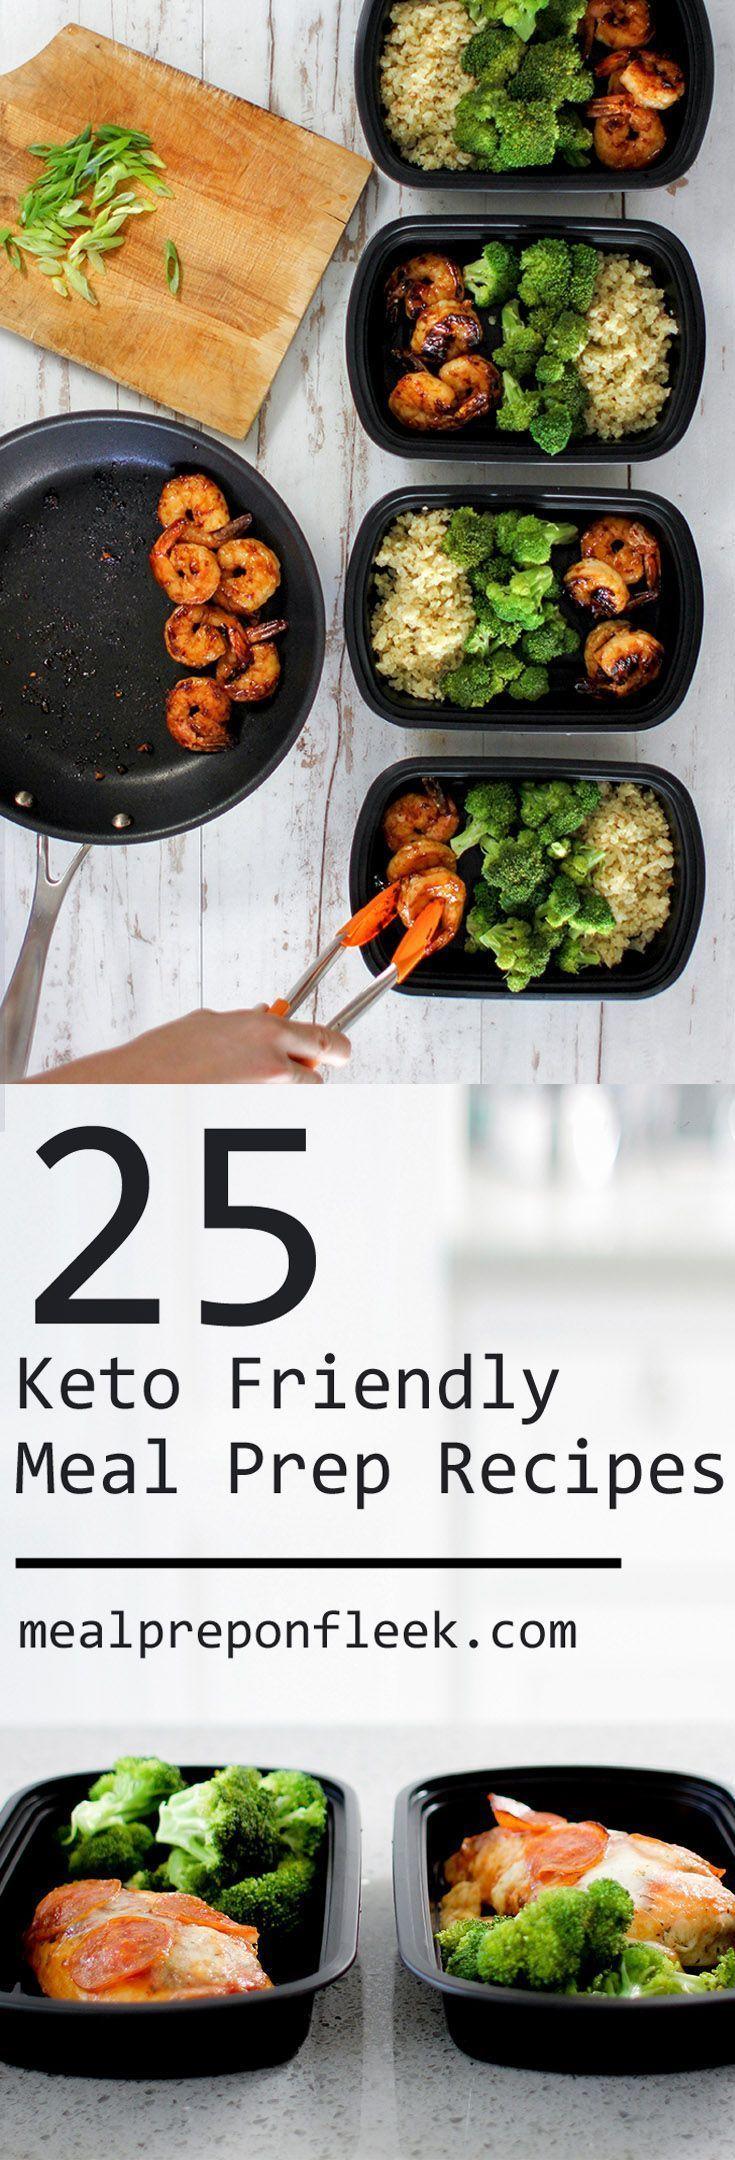 25 köstliche Keto-Diät-Rezepte: fettreiche, kohlenhydratarme Keto-Diät. Ketomahlzeitvorbereitun